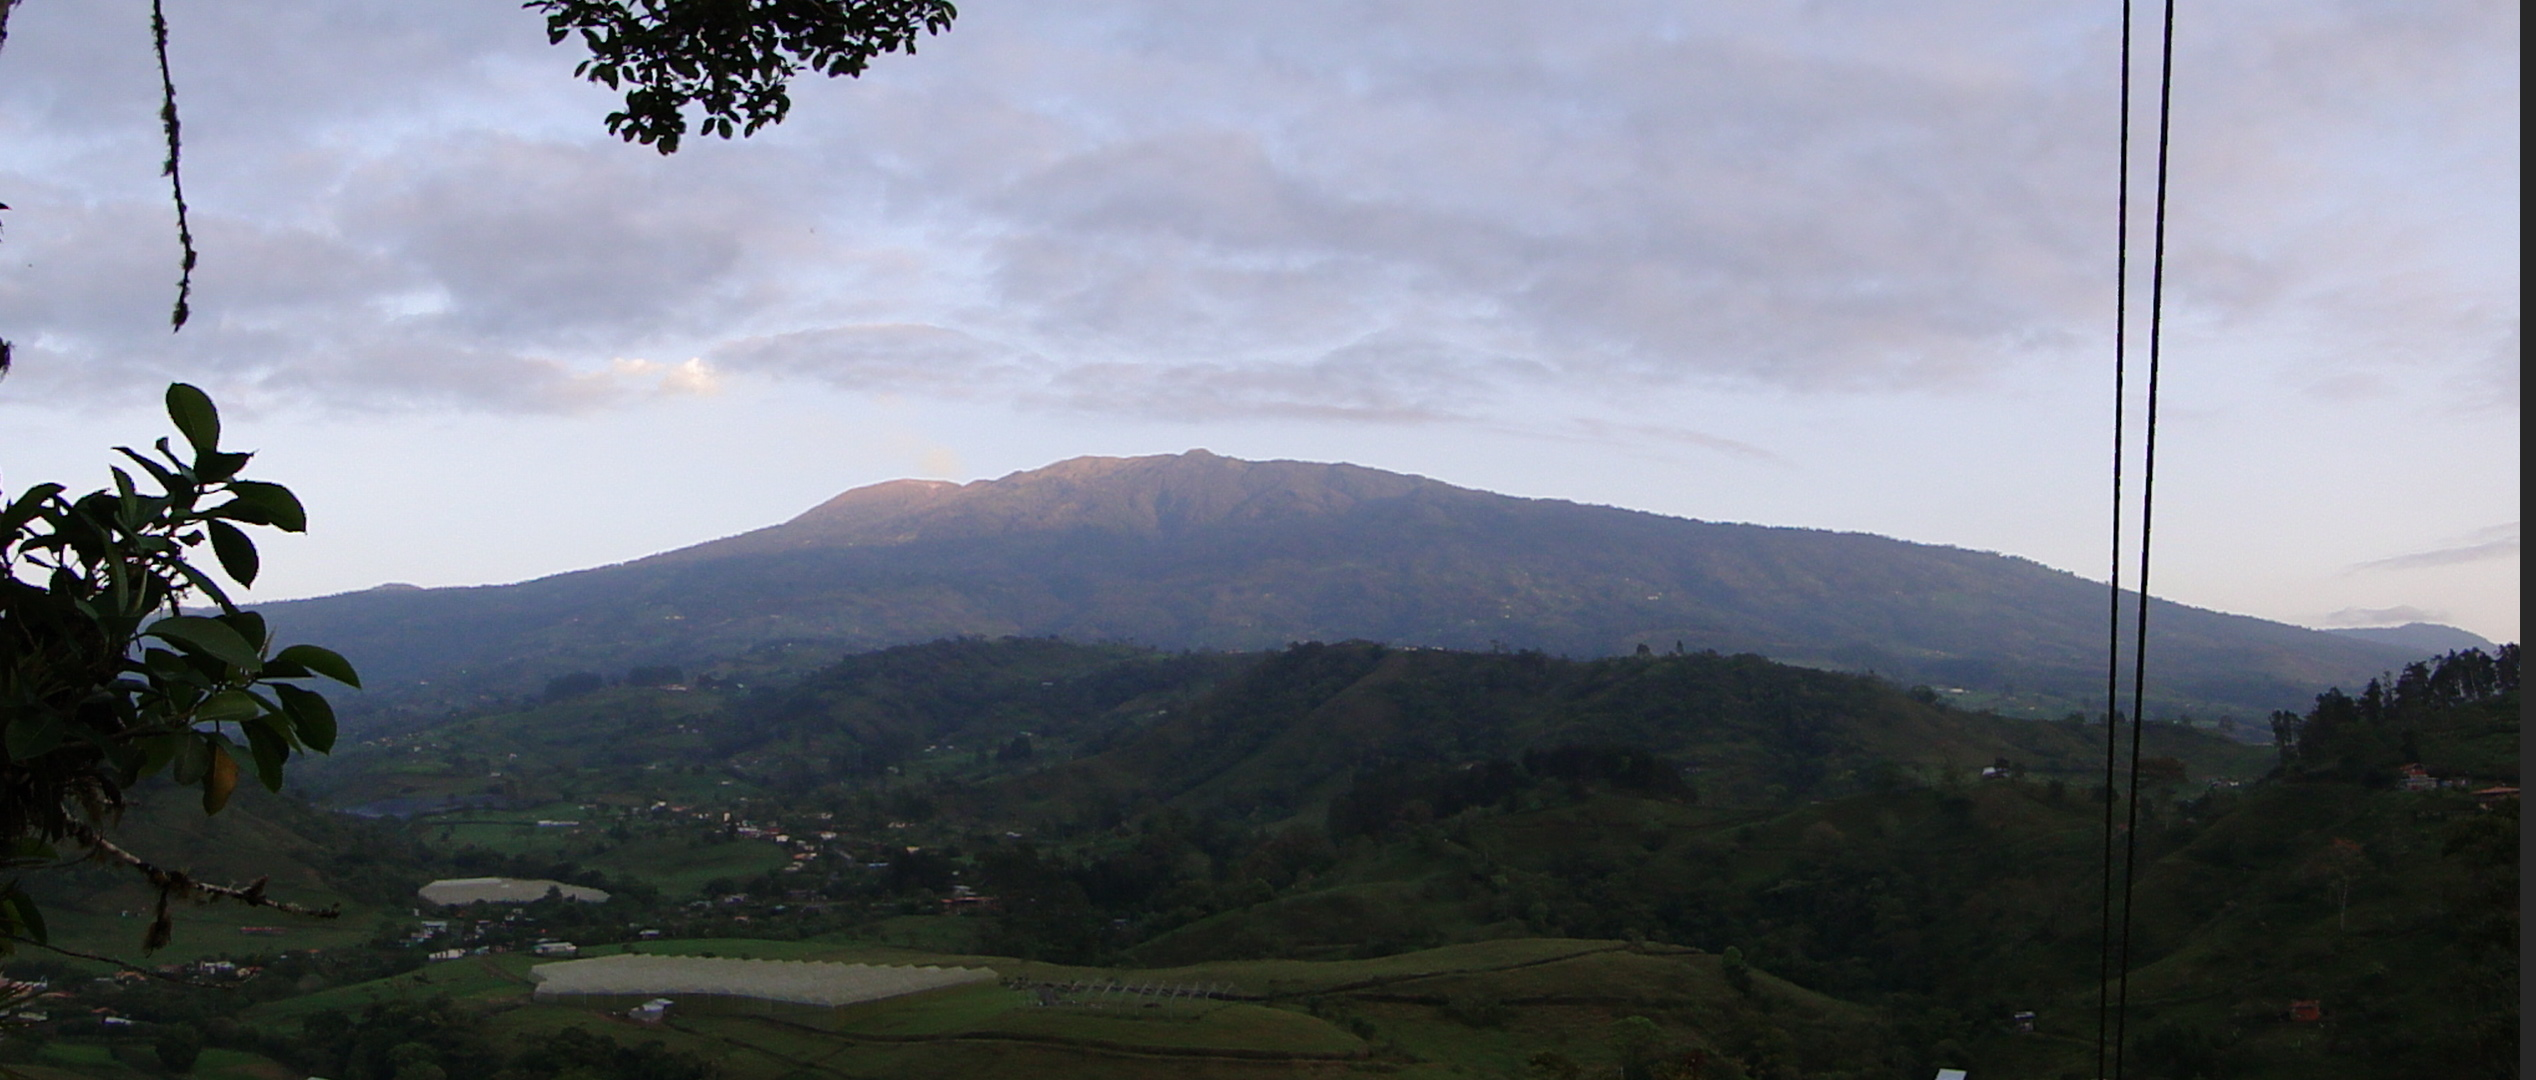 Volcan Turrialba Costa Rica